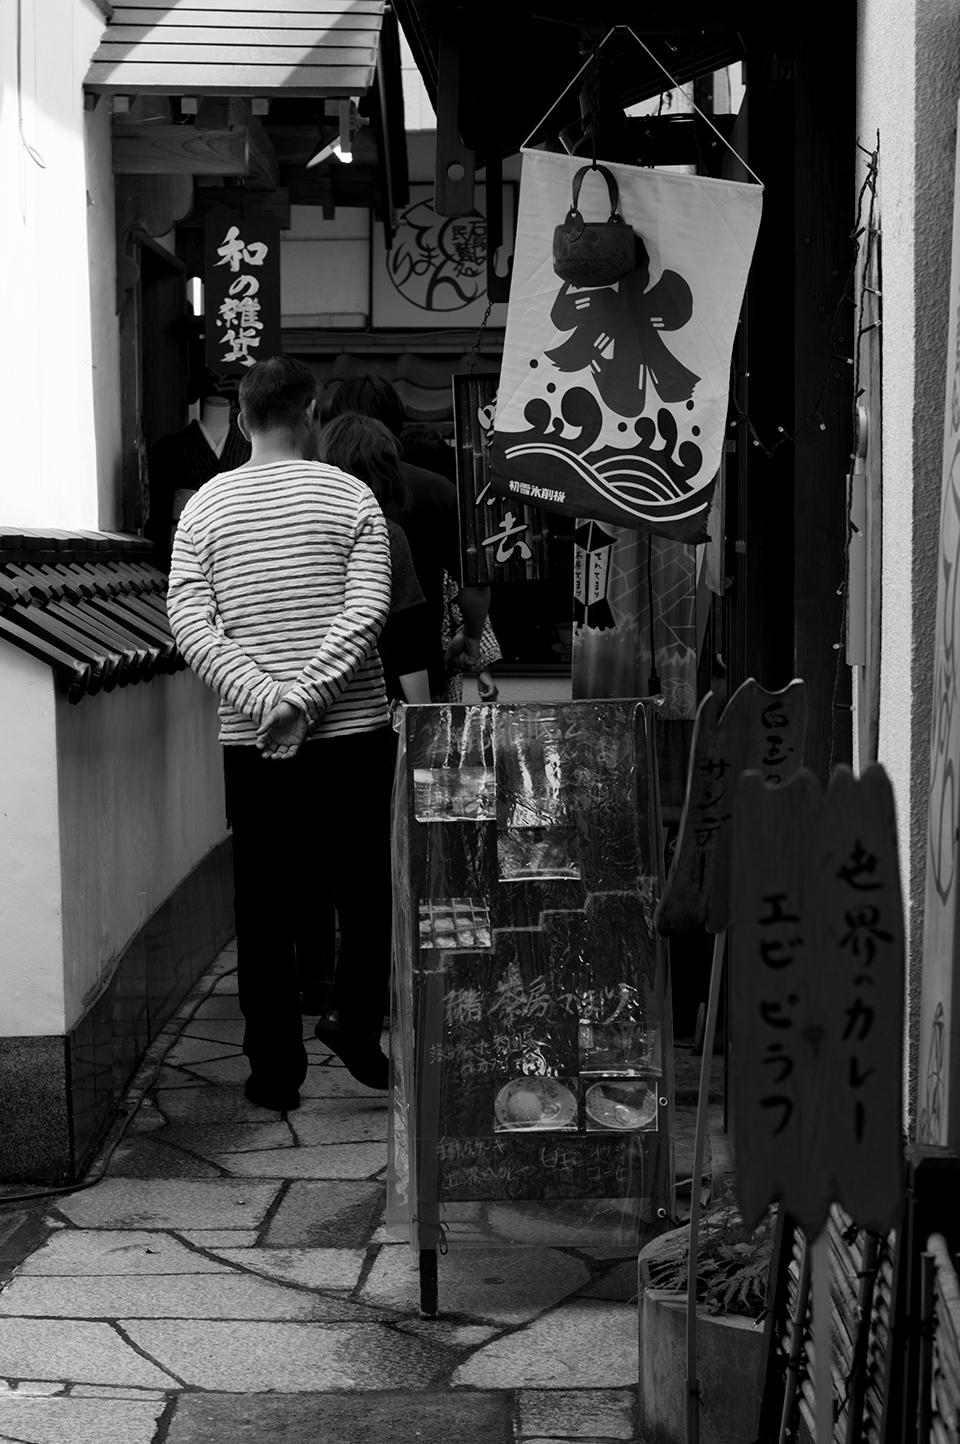 去年の社員旅行(伊香保温泉 2015/05/16)